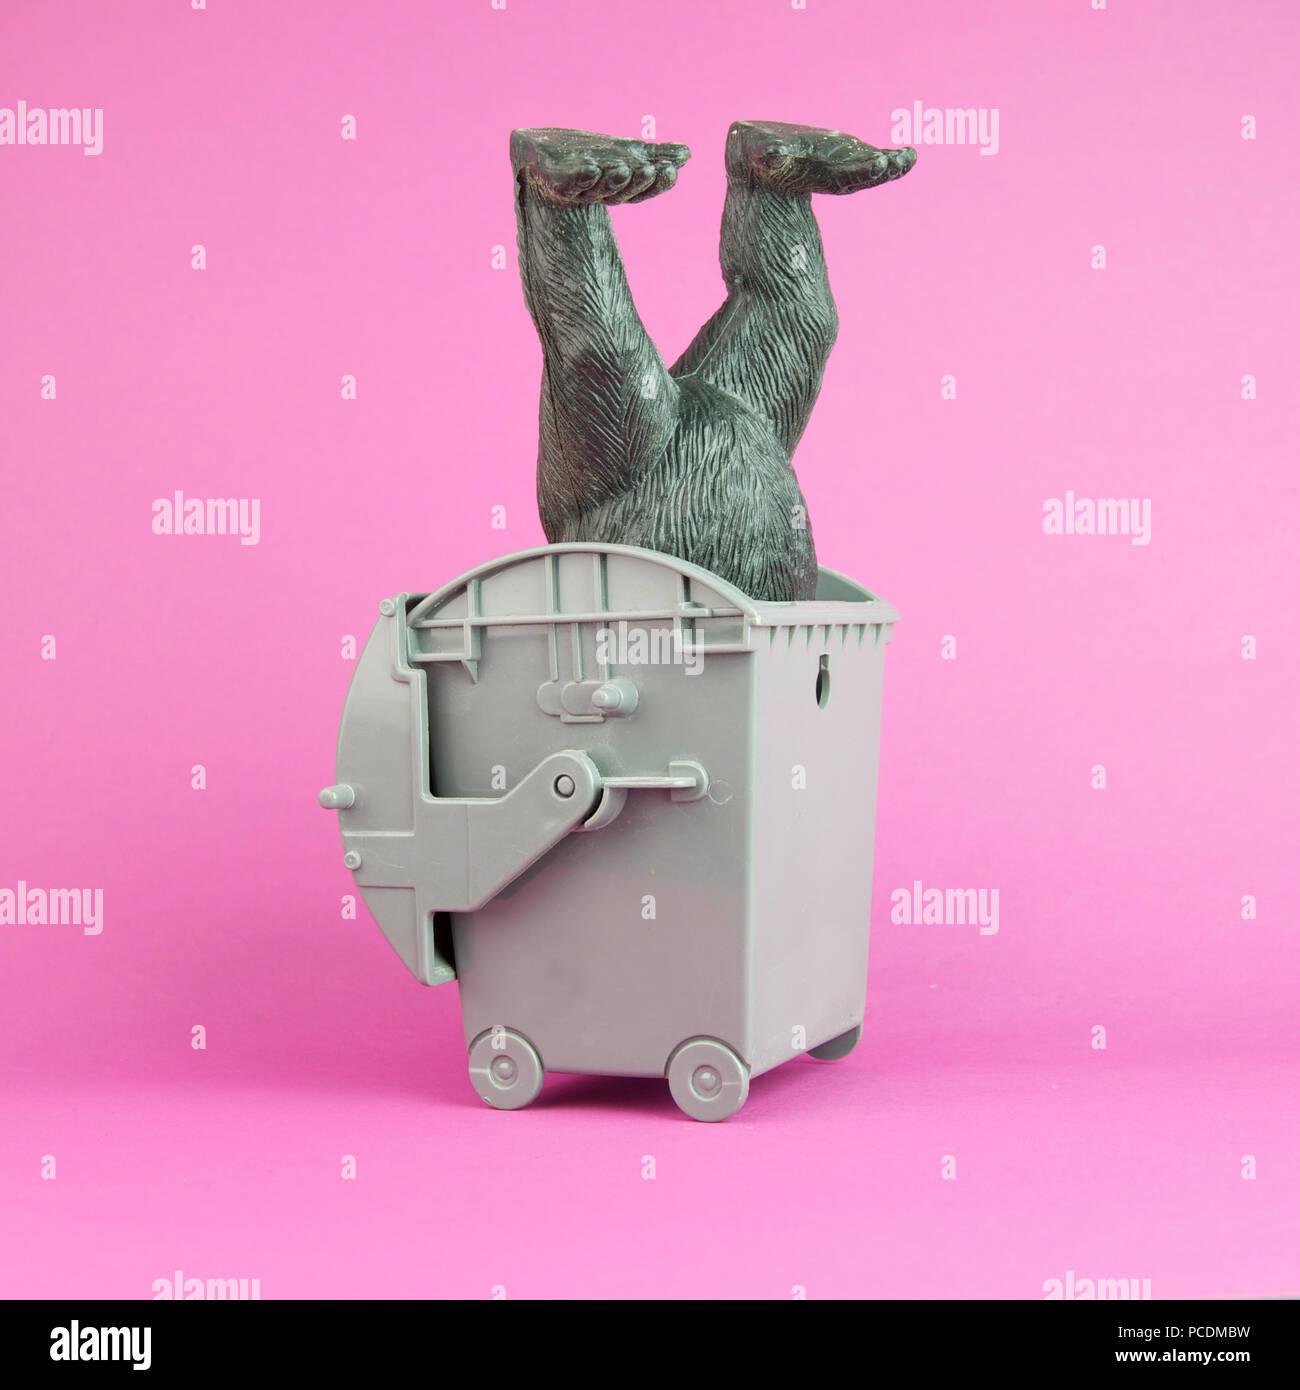 dustbin,garbage bin,headfirst,comic,toy figure - Stock Image